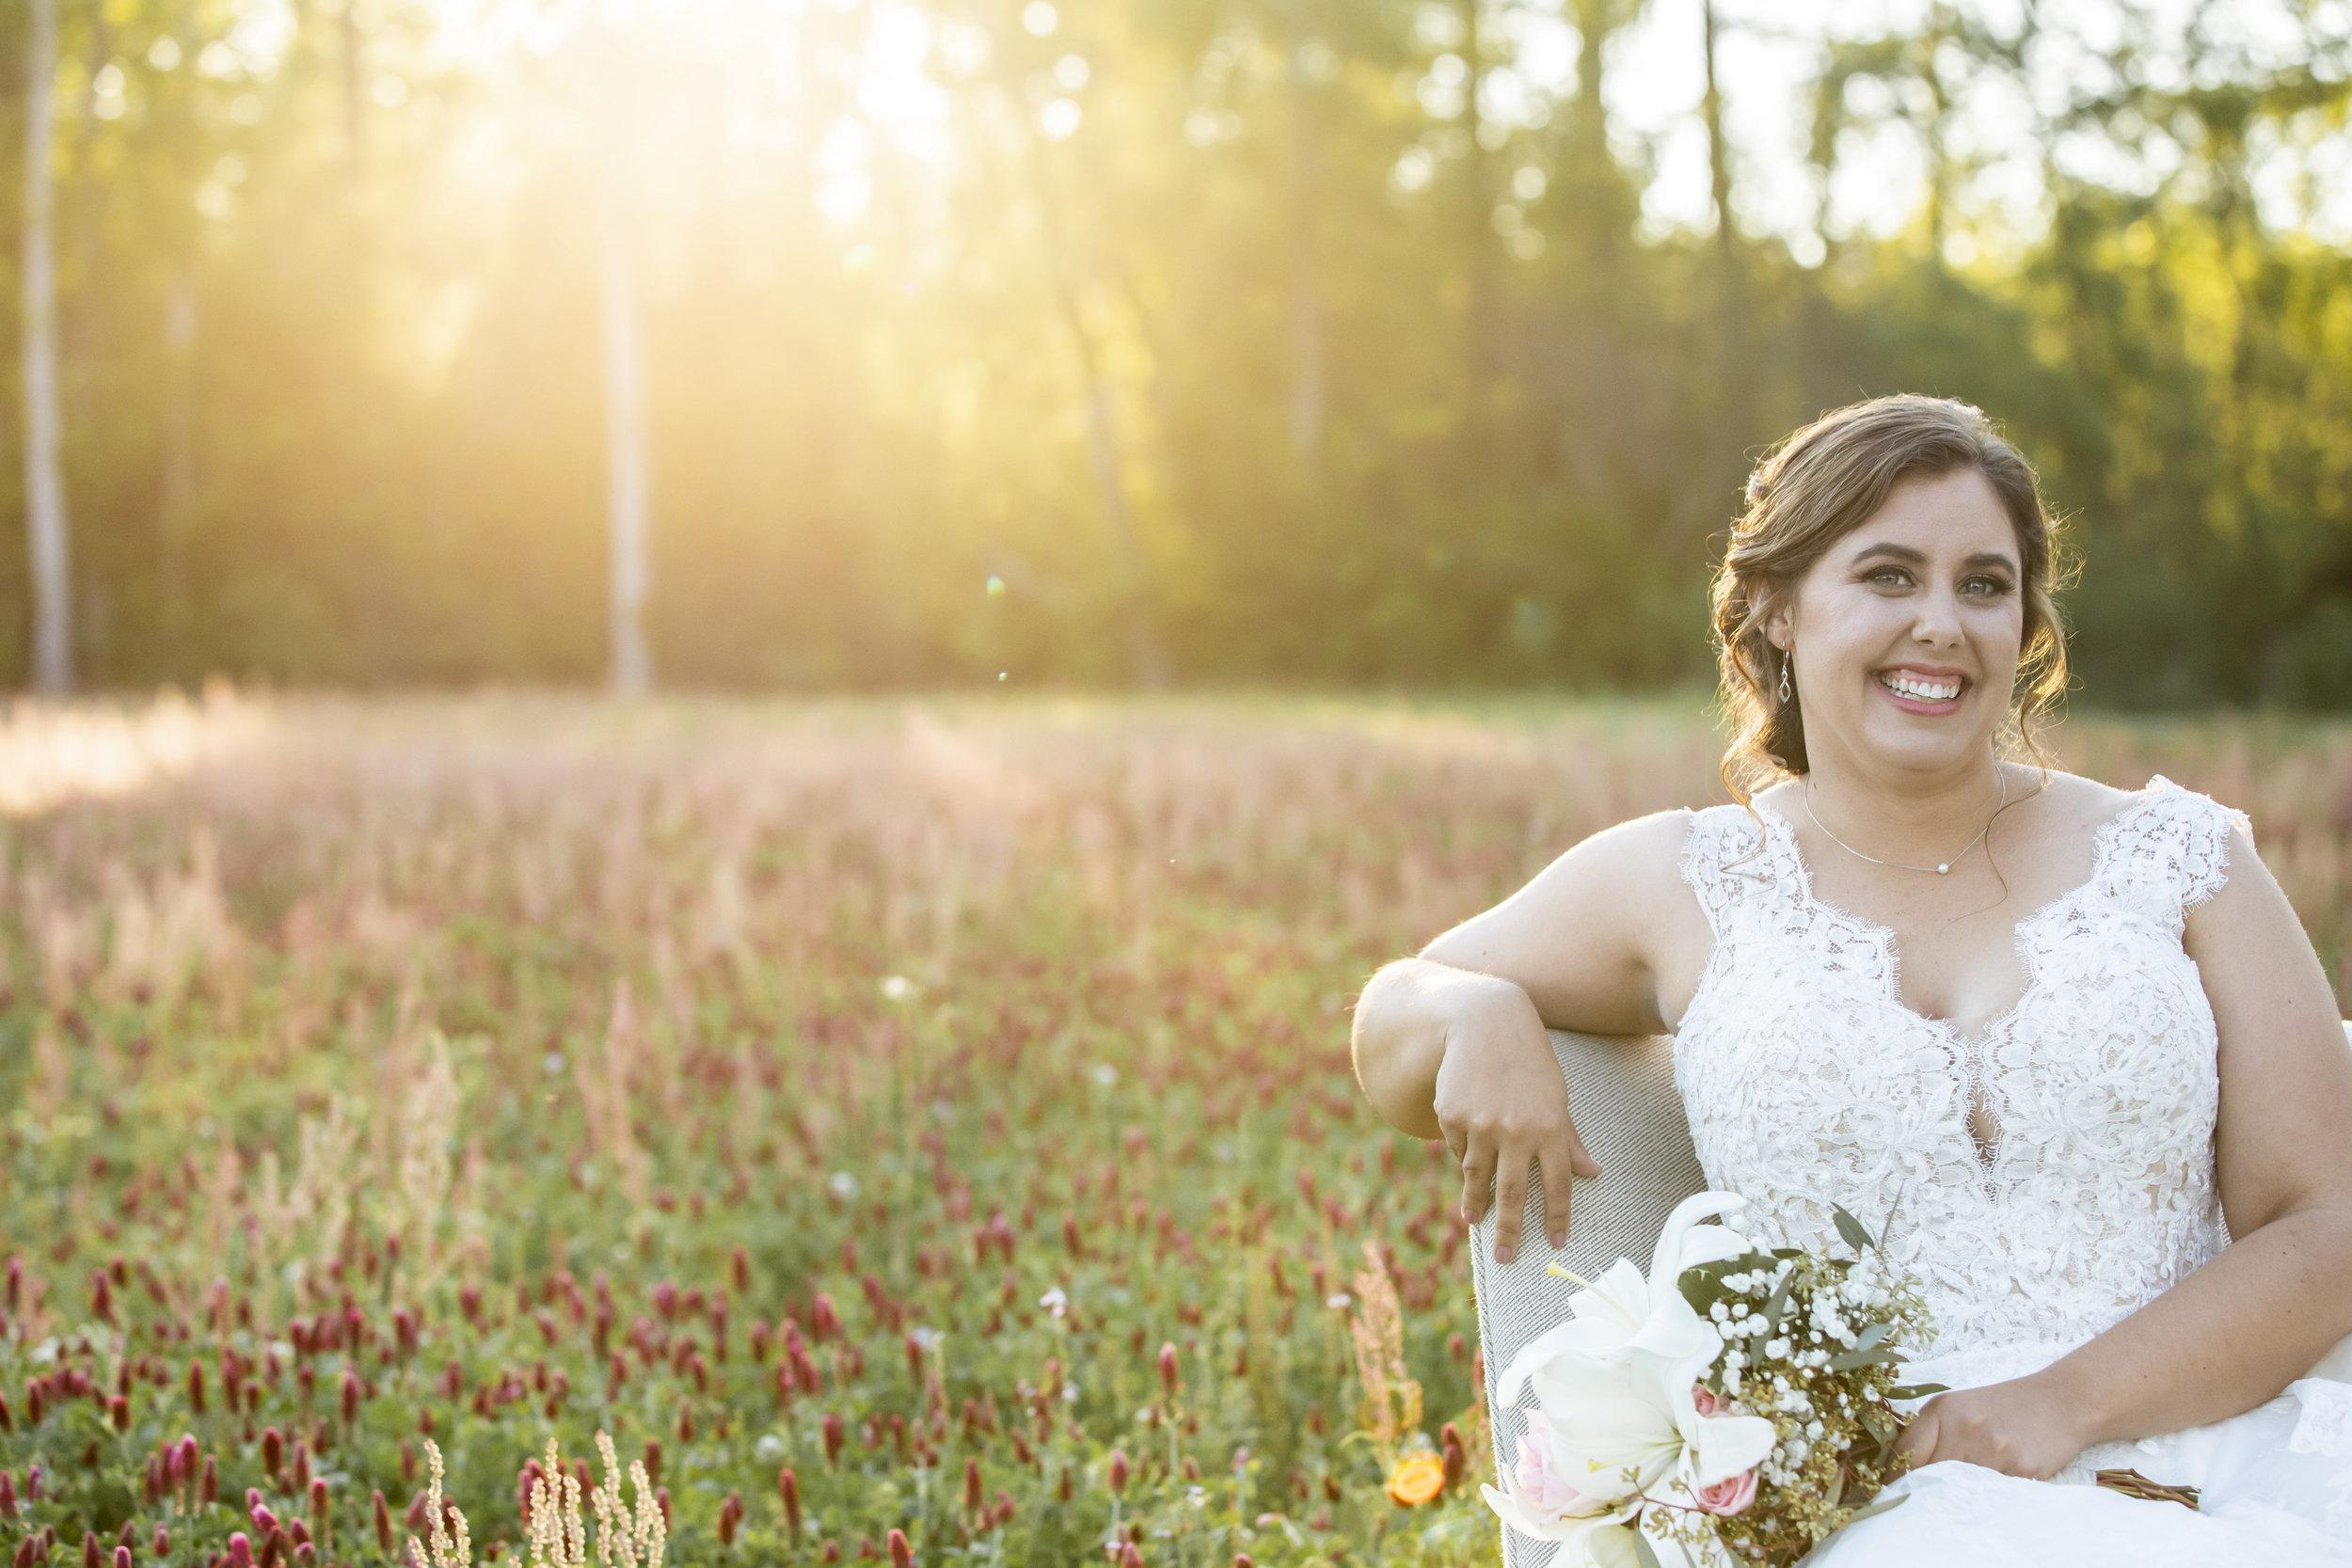 Bridal-Bridal-0058.jpg